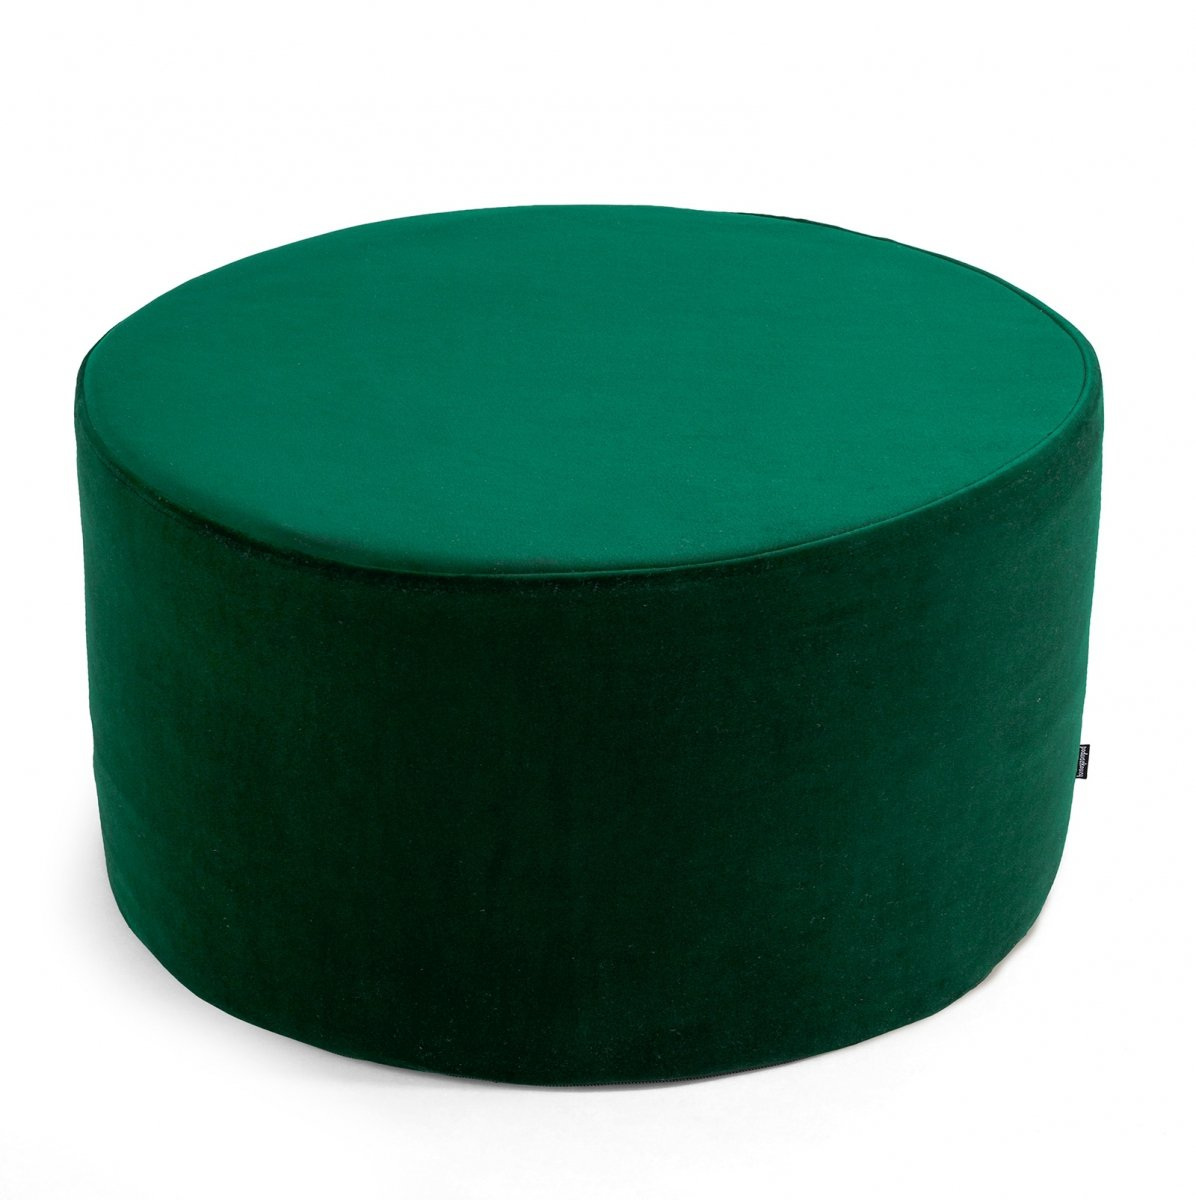 Duża ciemno zielona pufa welurowa 60x30